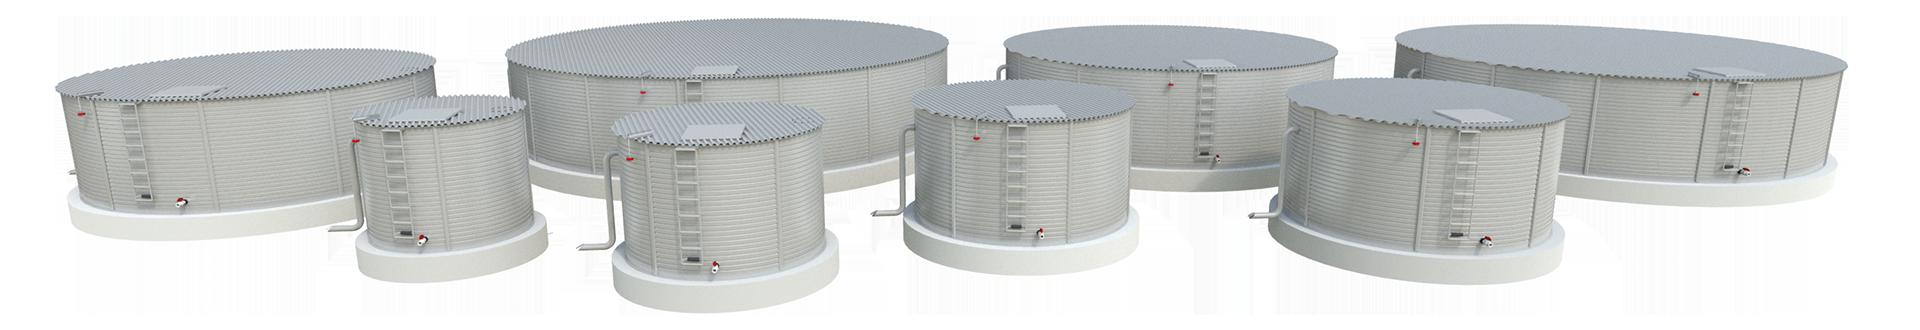 Tanks - Metal Water Tanks - Pioneer Water Tanks - Rain Harvesting